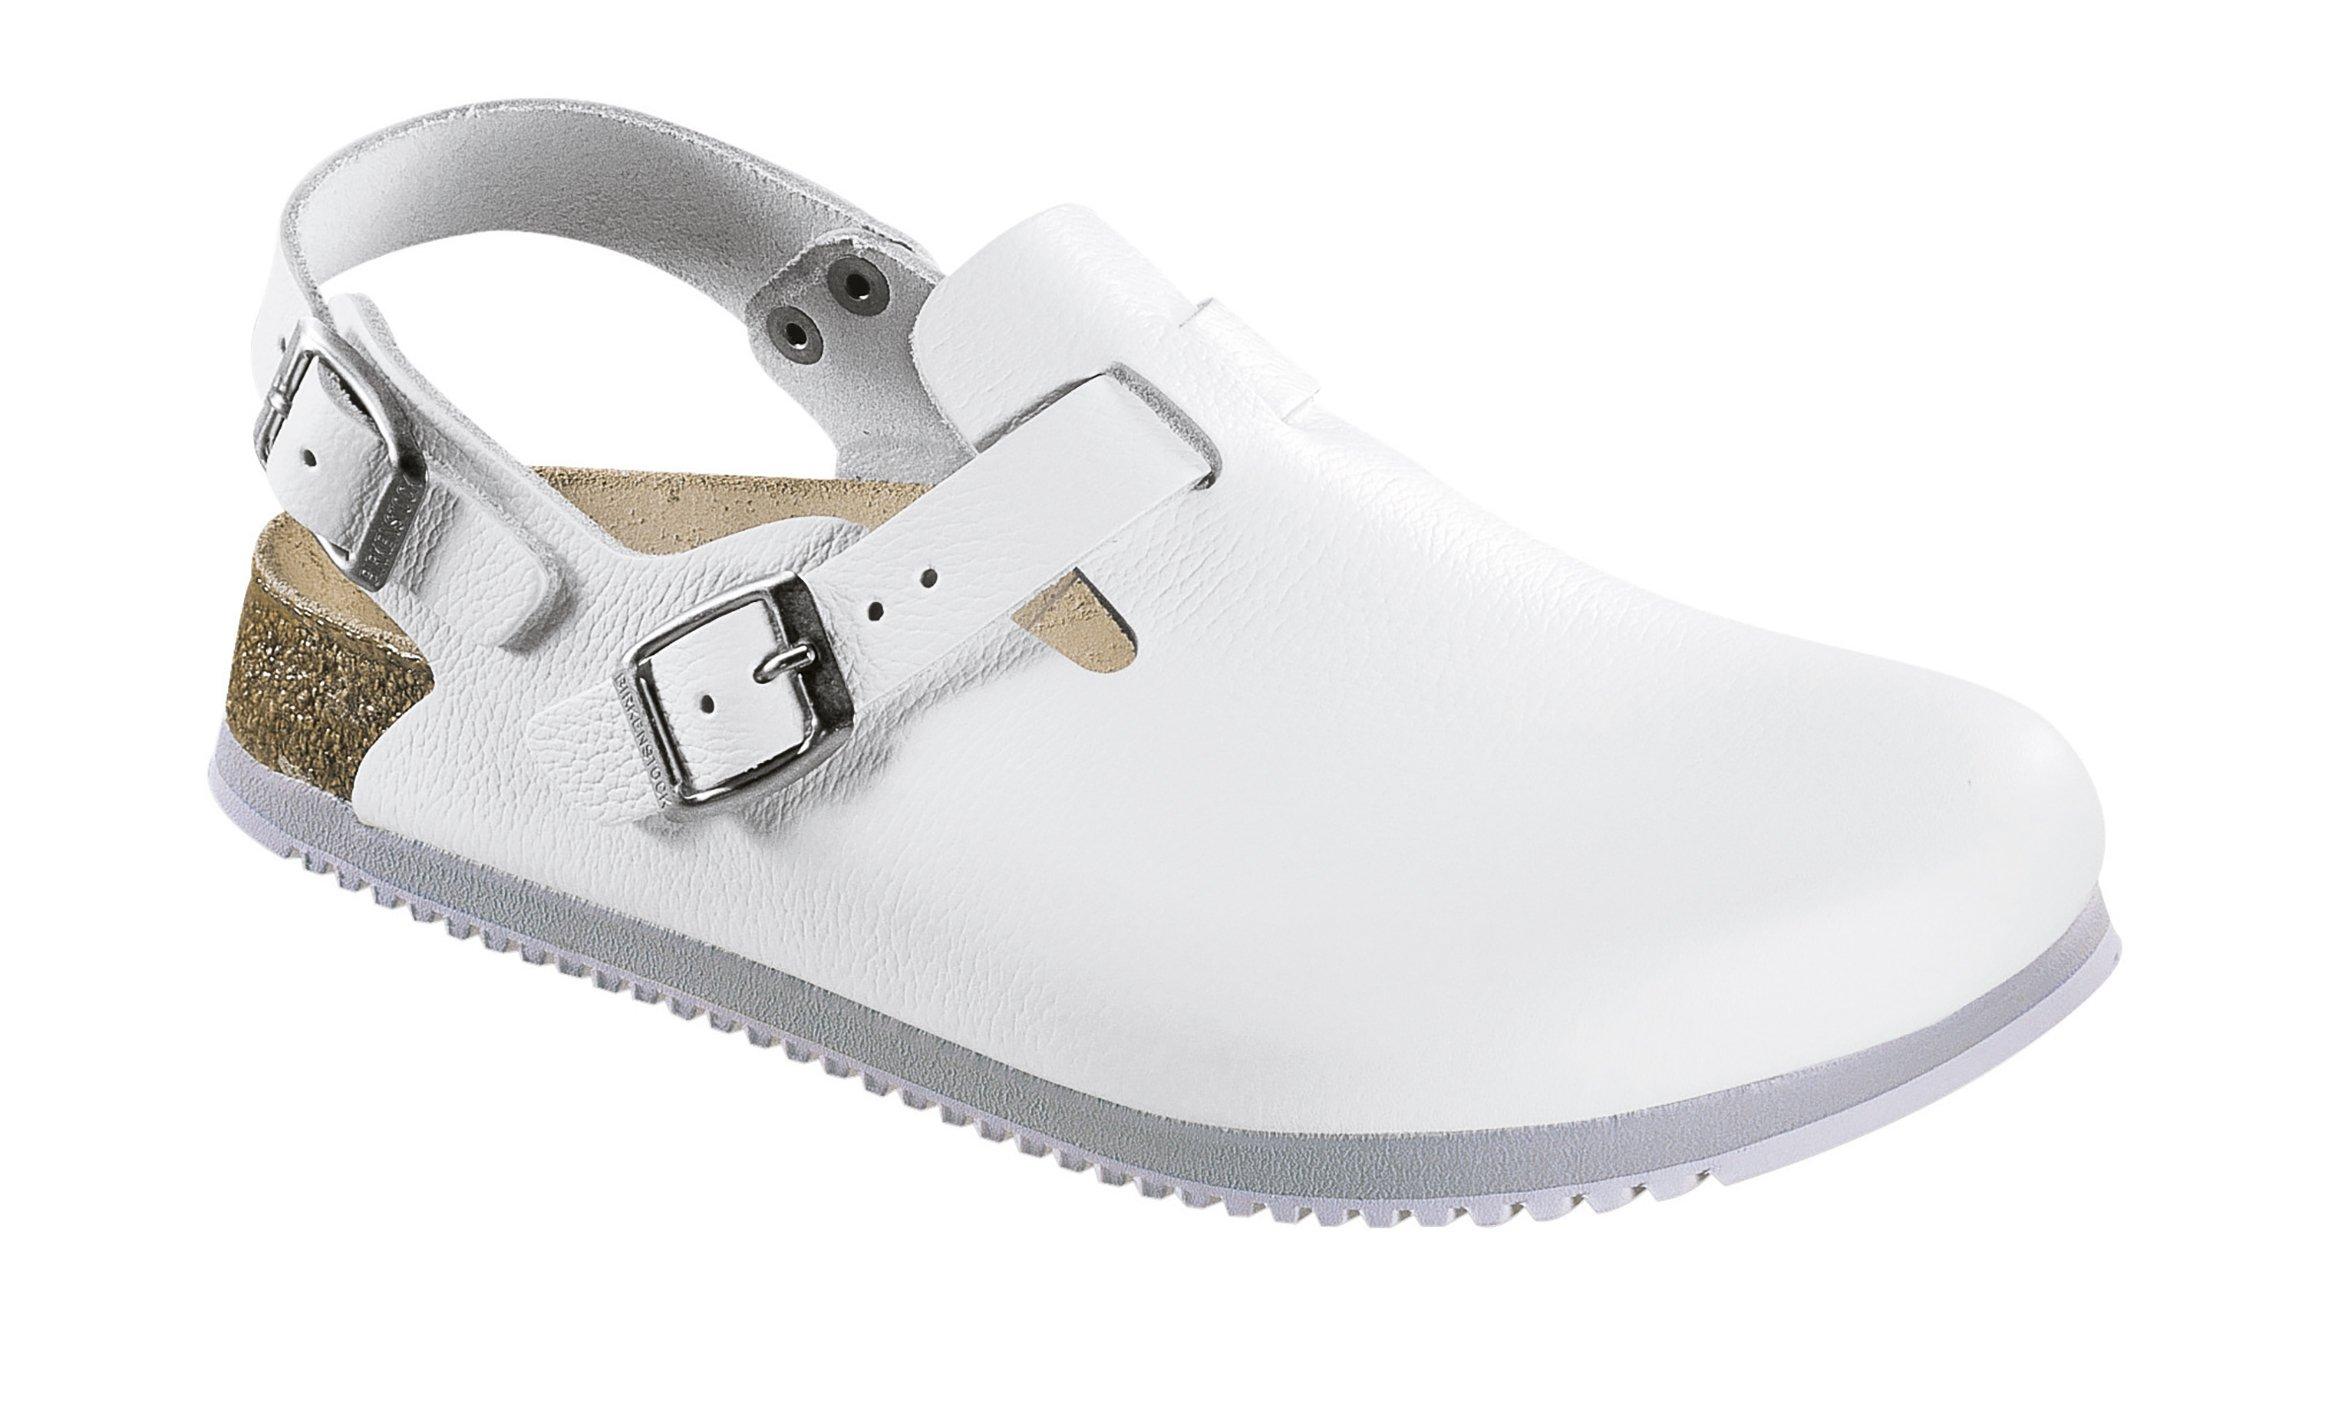 Birkenstock Unisex Professional Tokyo Super Grip Leather Slip Resistant Work Shoe,White, 36 N EU /5-5.5 N US Women